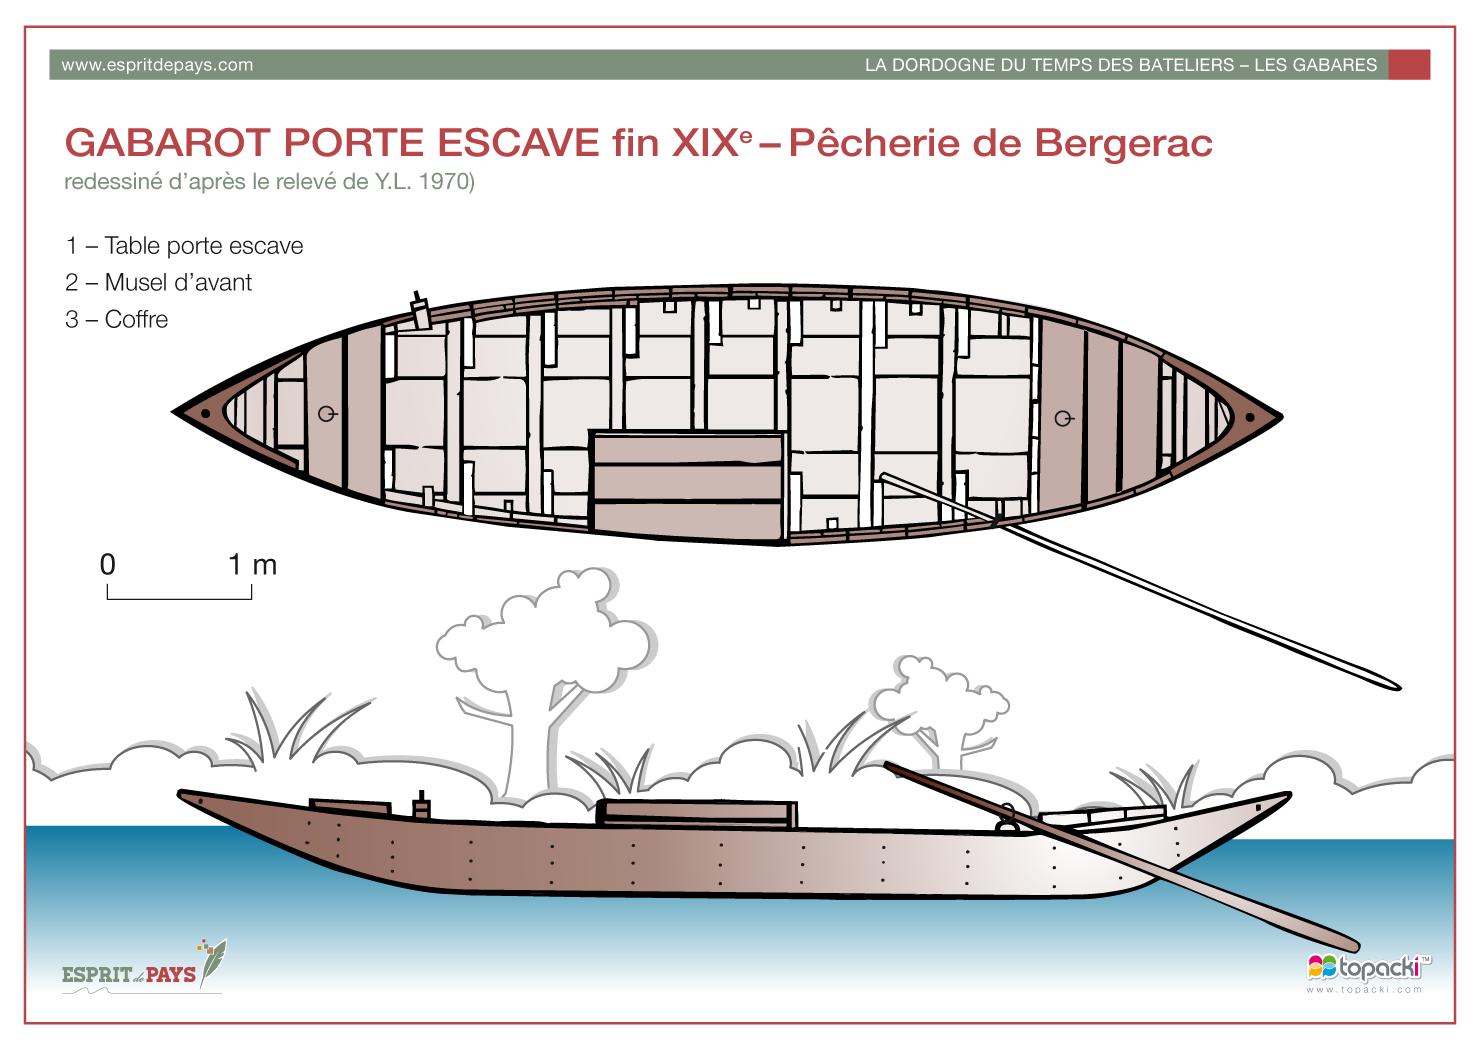 Croquis : Gabarot Porte Escave – Pêcherie de Bergerac